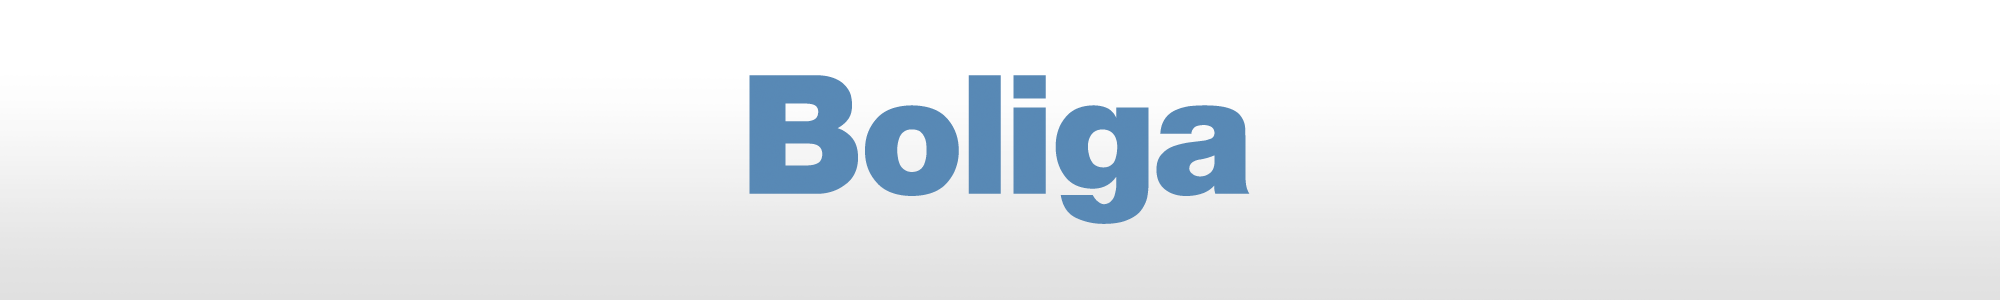 Job hos Boliga